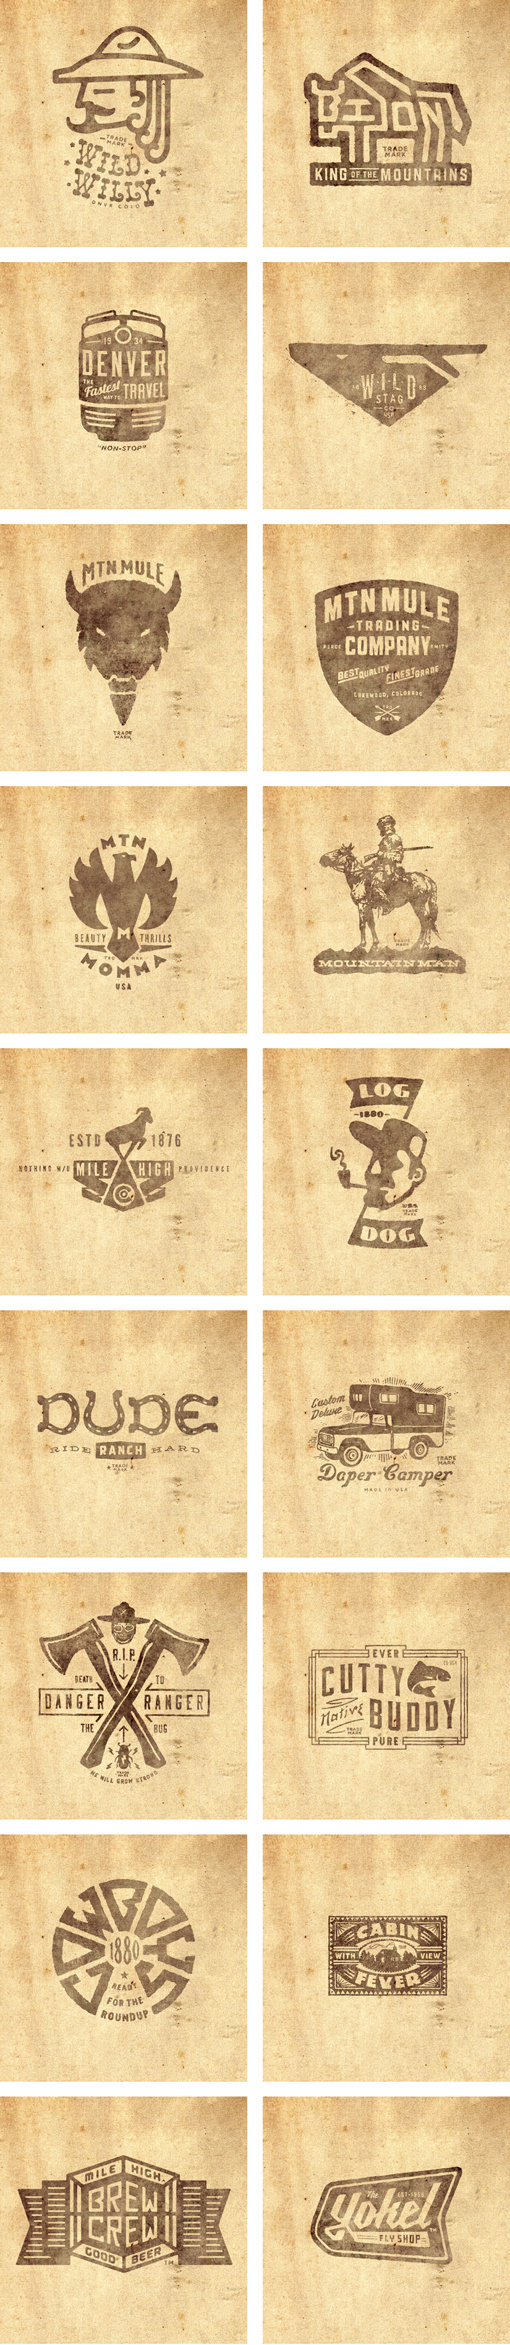 THINKMULE™ MTN MULE™ TRADING COMPANY logos set. #thinkmule #colorado #pruitt #vintage #logo #jeremy